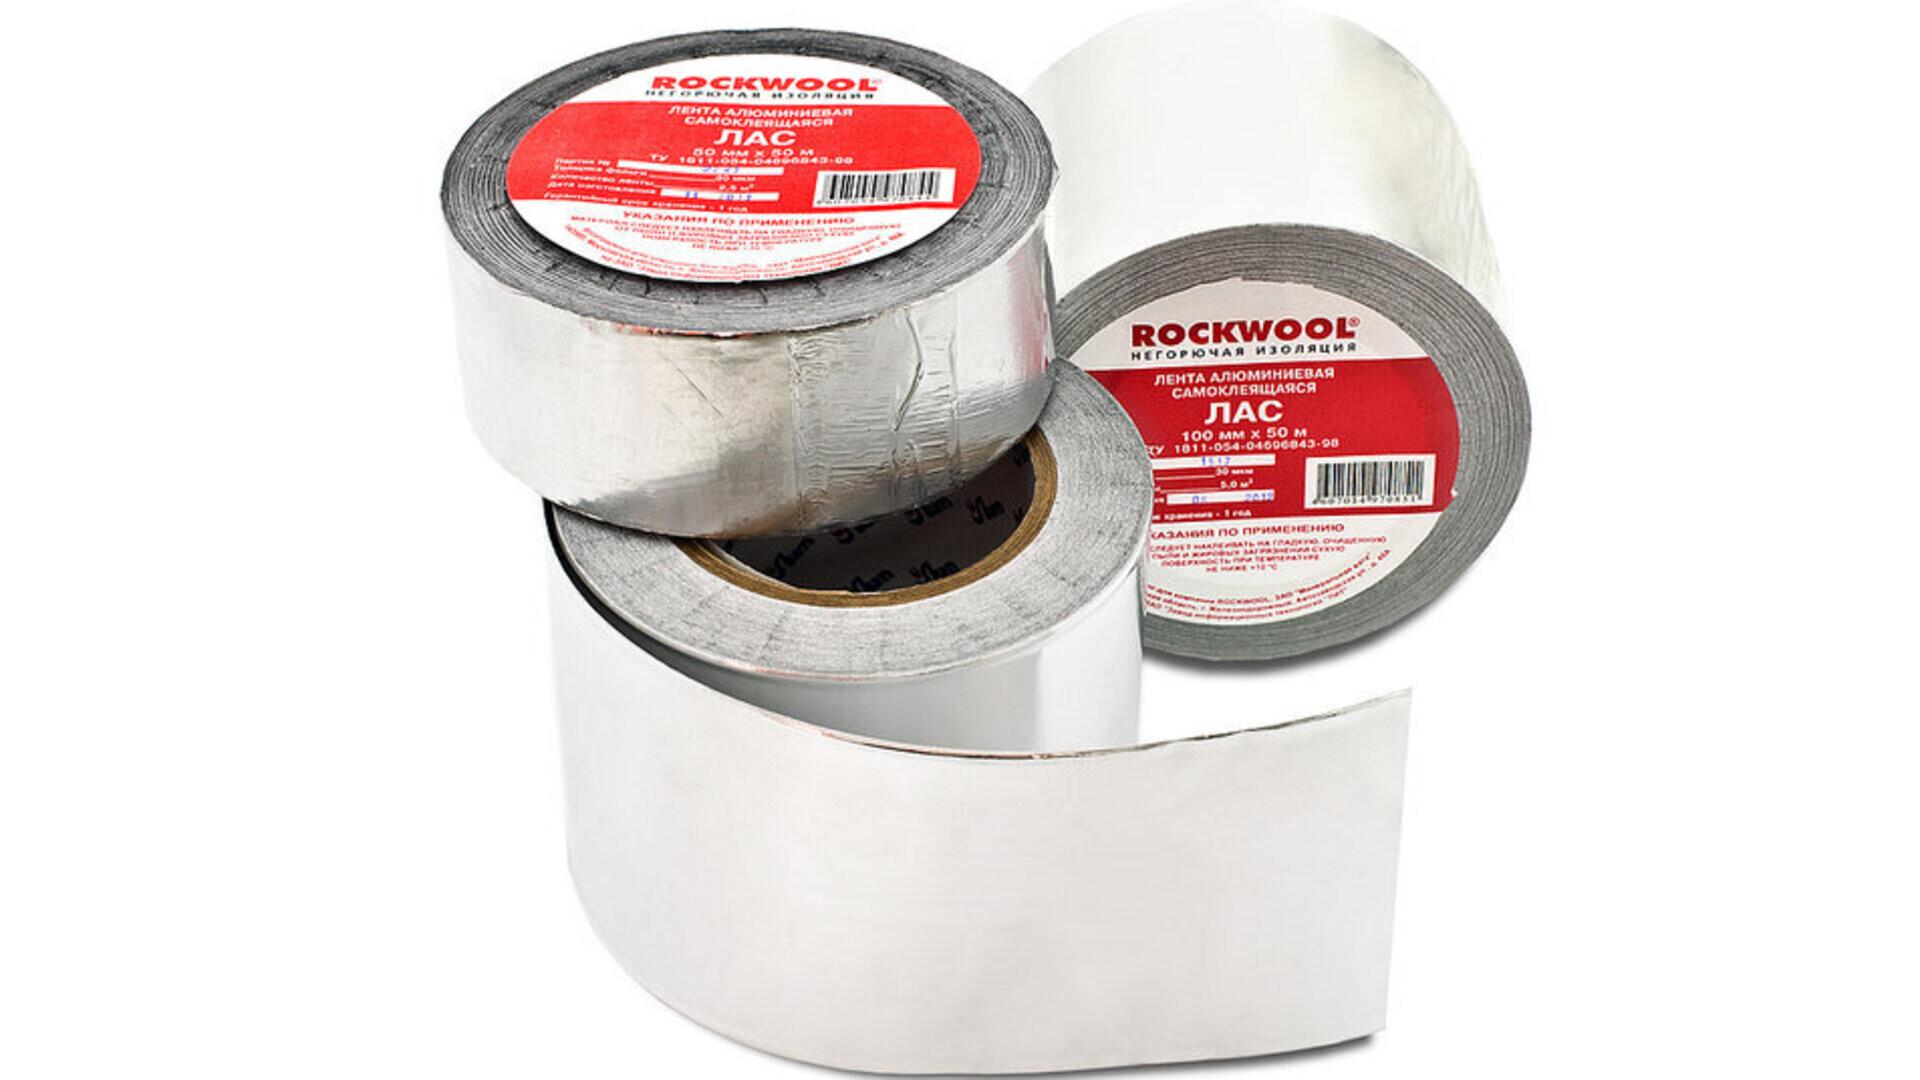 Self-adheisive aluminium tape, package, product,  components, Rockfire, ETICS, HVAC